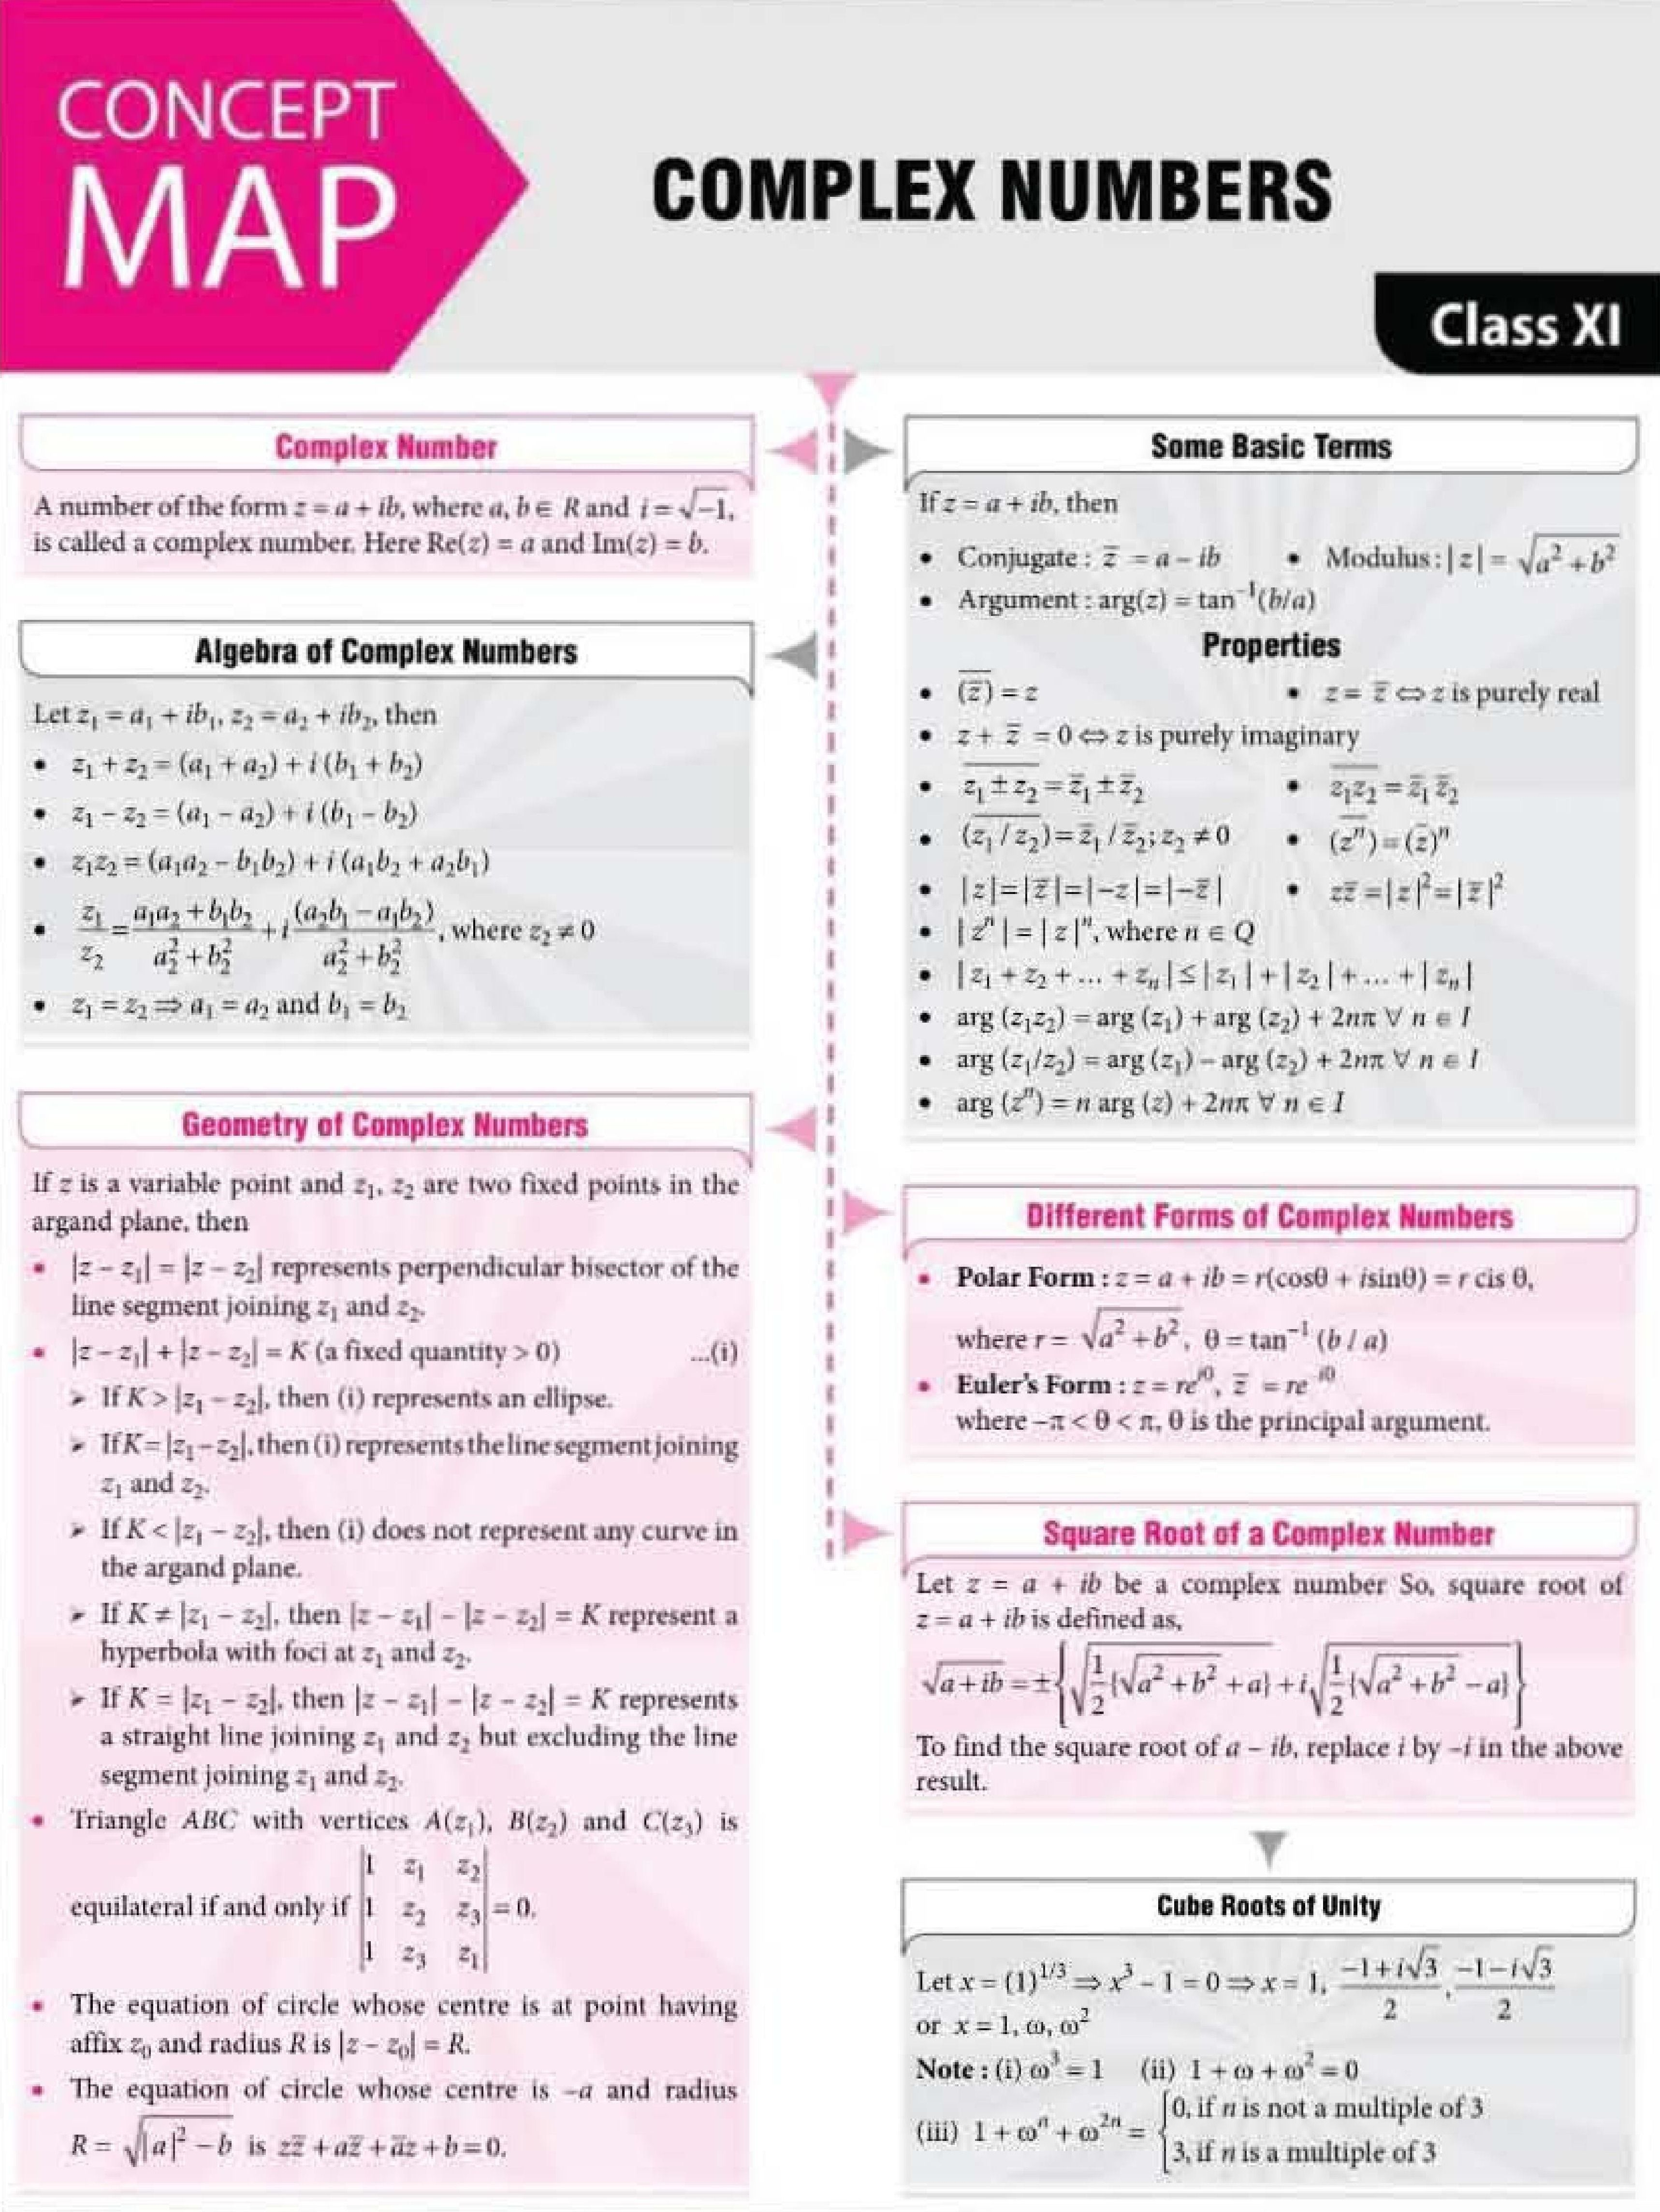 Source 2019 Vol 8 Mtg Mathematics Today Jeemain Jeeadvanced Physics And Mathematics Physics And Mathematics Educat Math Tutorials Studying Math Math Methods [ 4575 x 3434 Pixel ]